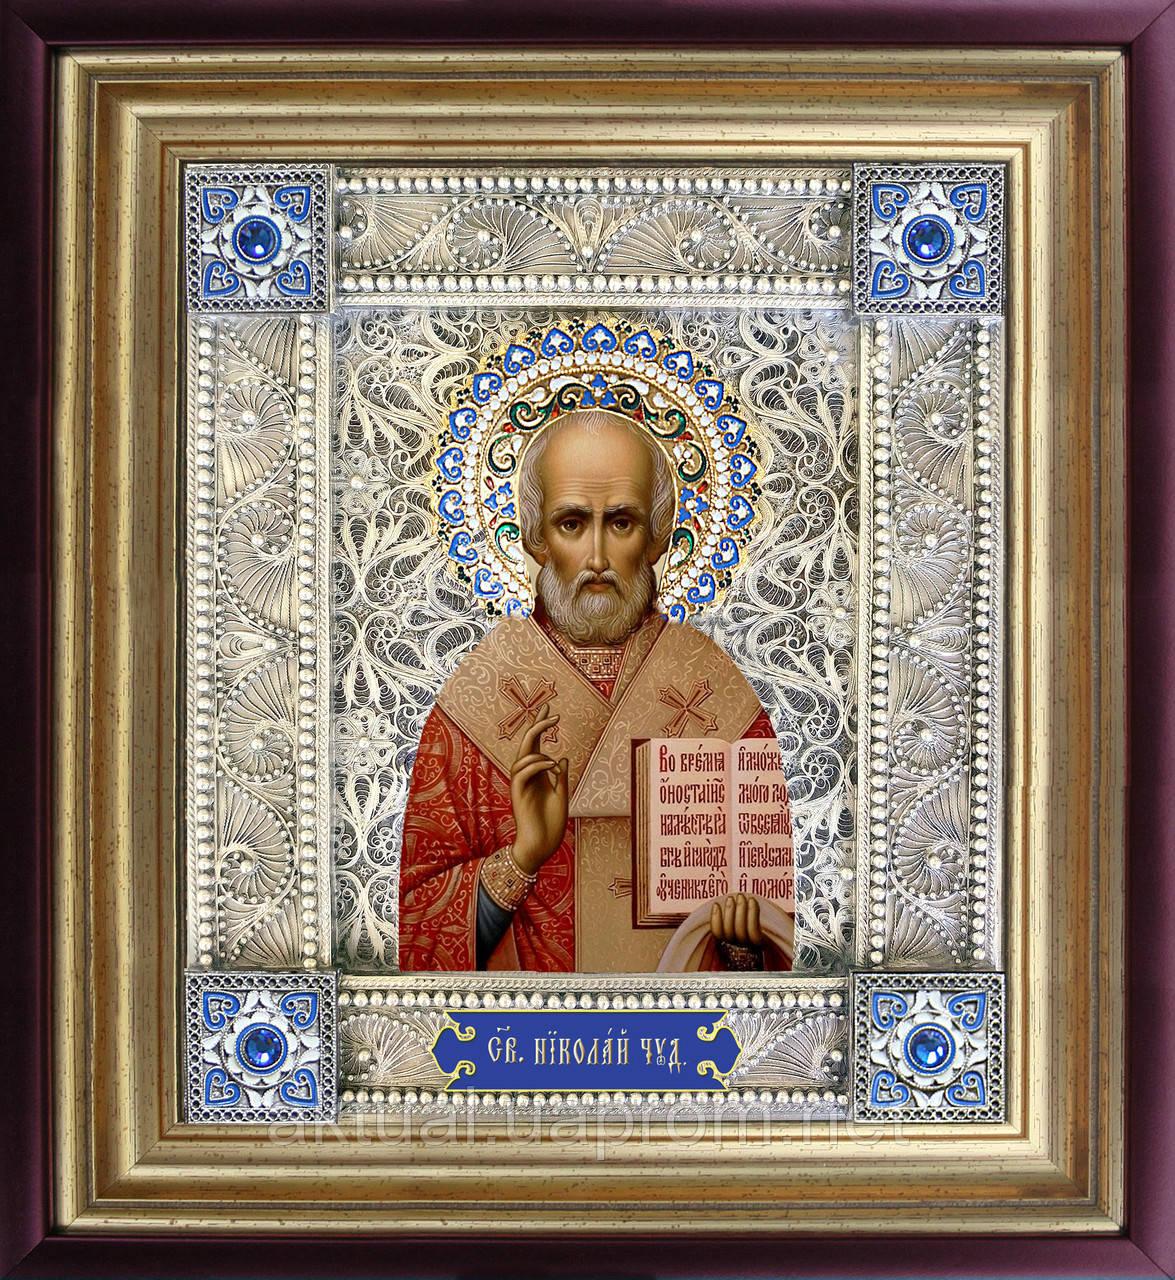 Святой Николай Чудотворец икона скань